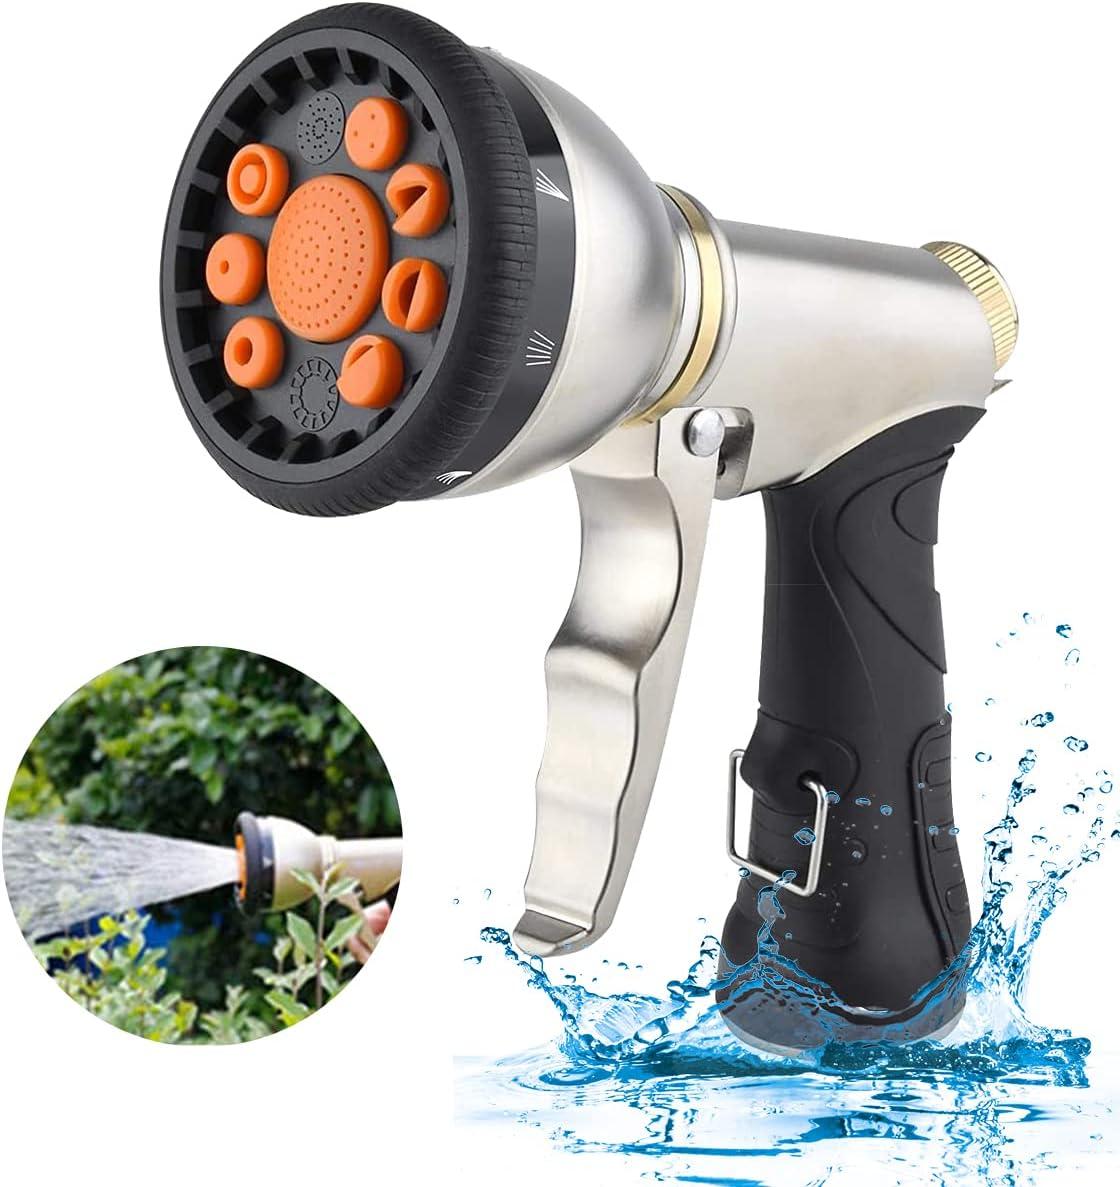 iFedio Hose Nozzle Garden Nozzle Heavy Duty Metal Hose Spray Water Nozzle,9 Adjustable Spray Patterns Pistol Grip Gun Nozzle,Best High Pressure Leak Proof Lawn Sprayer for Plants,Car Wash,Pets Shower